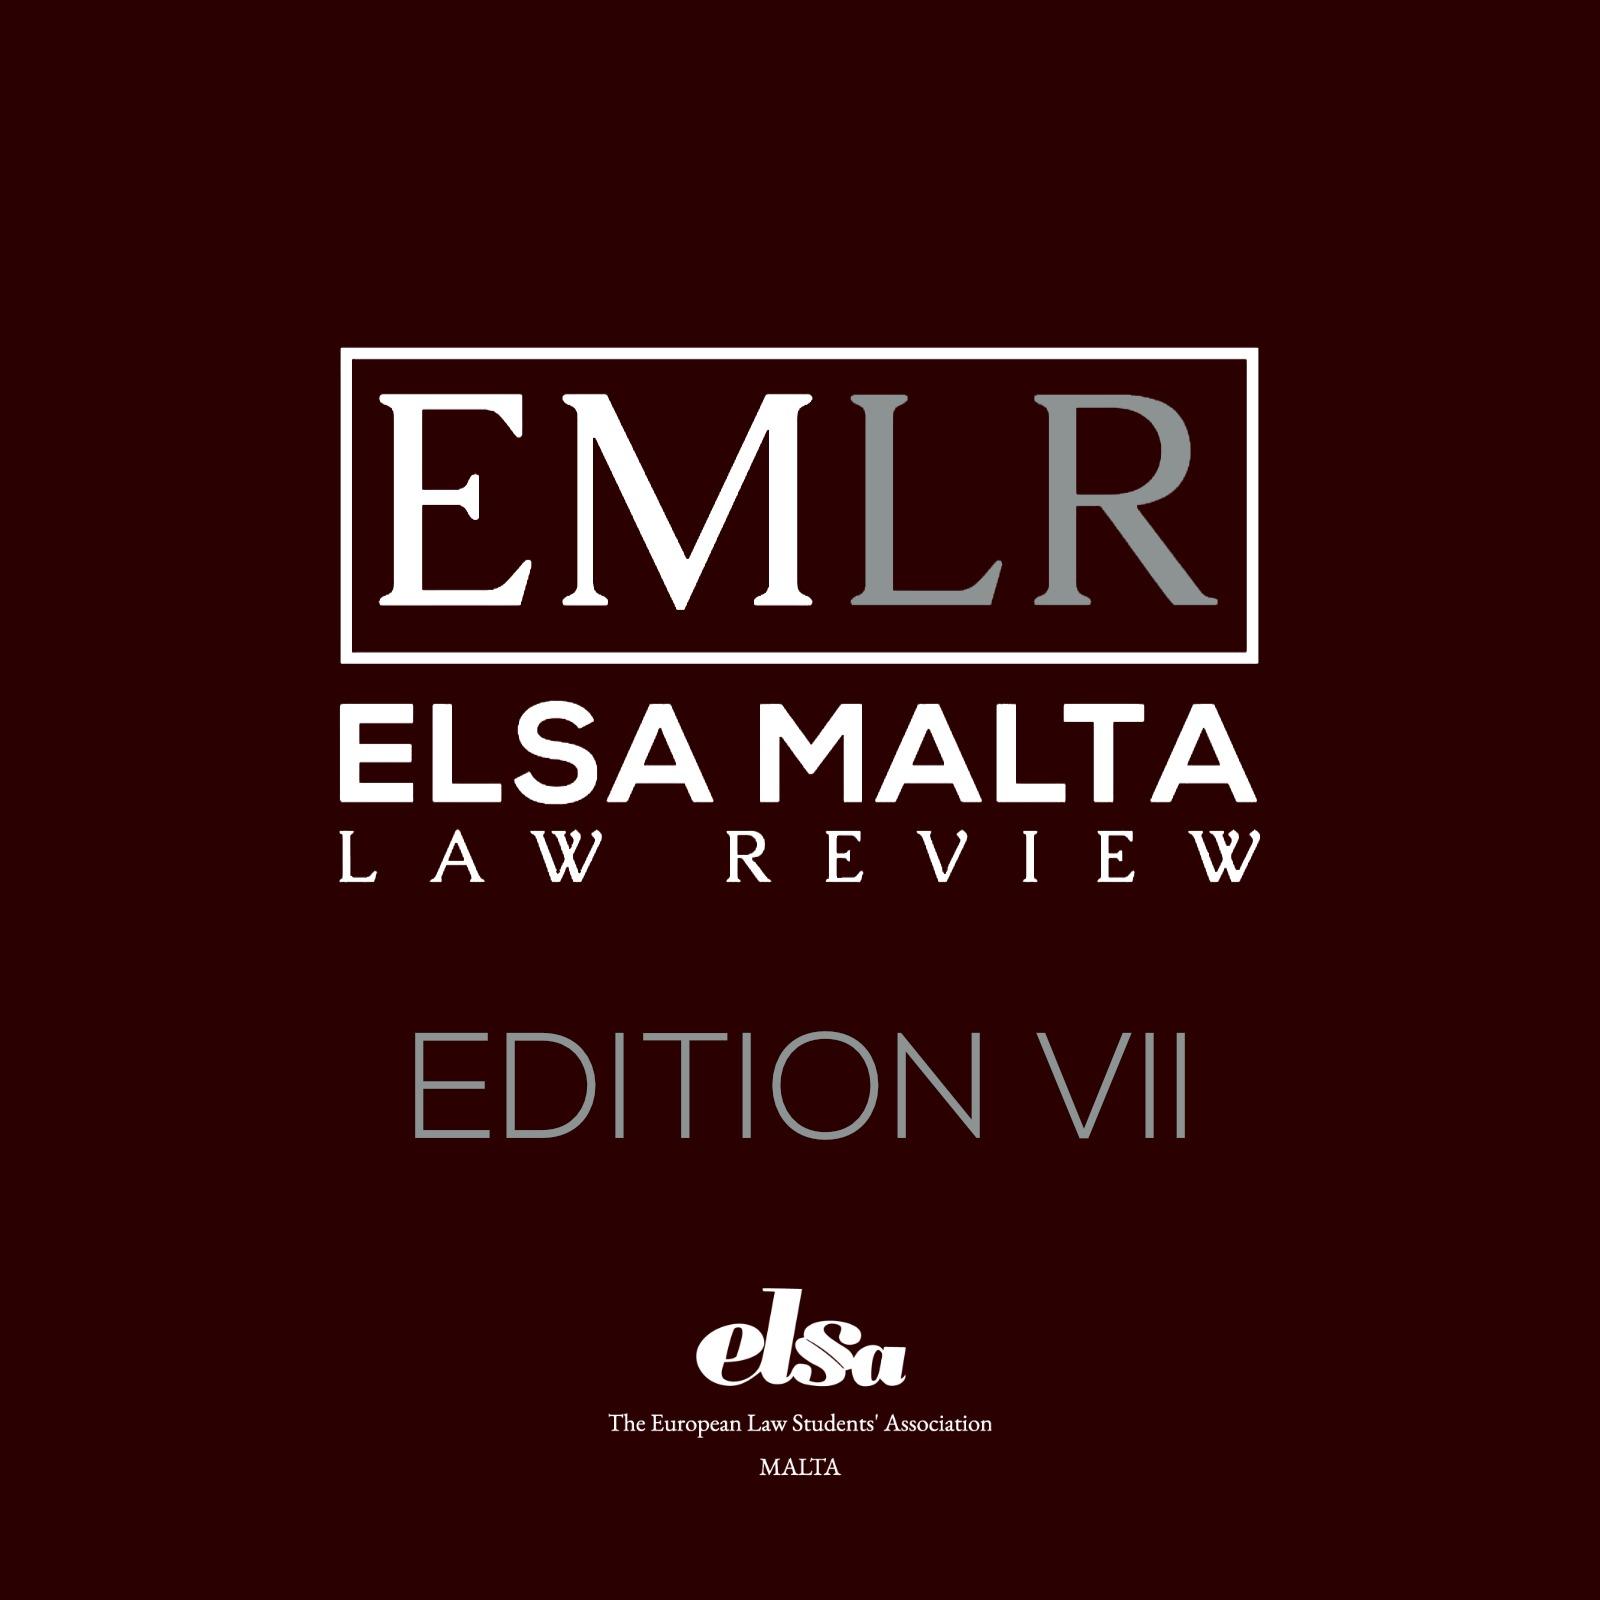 Edition VII